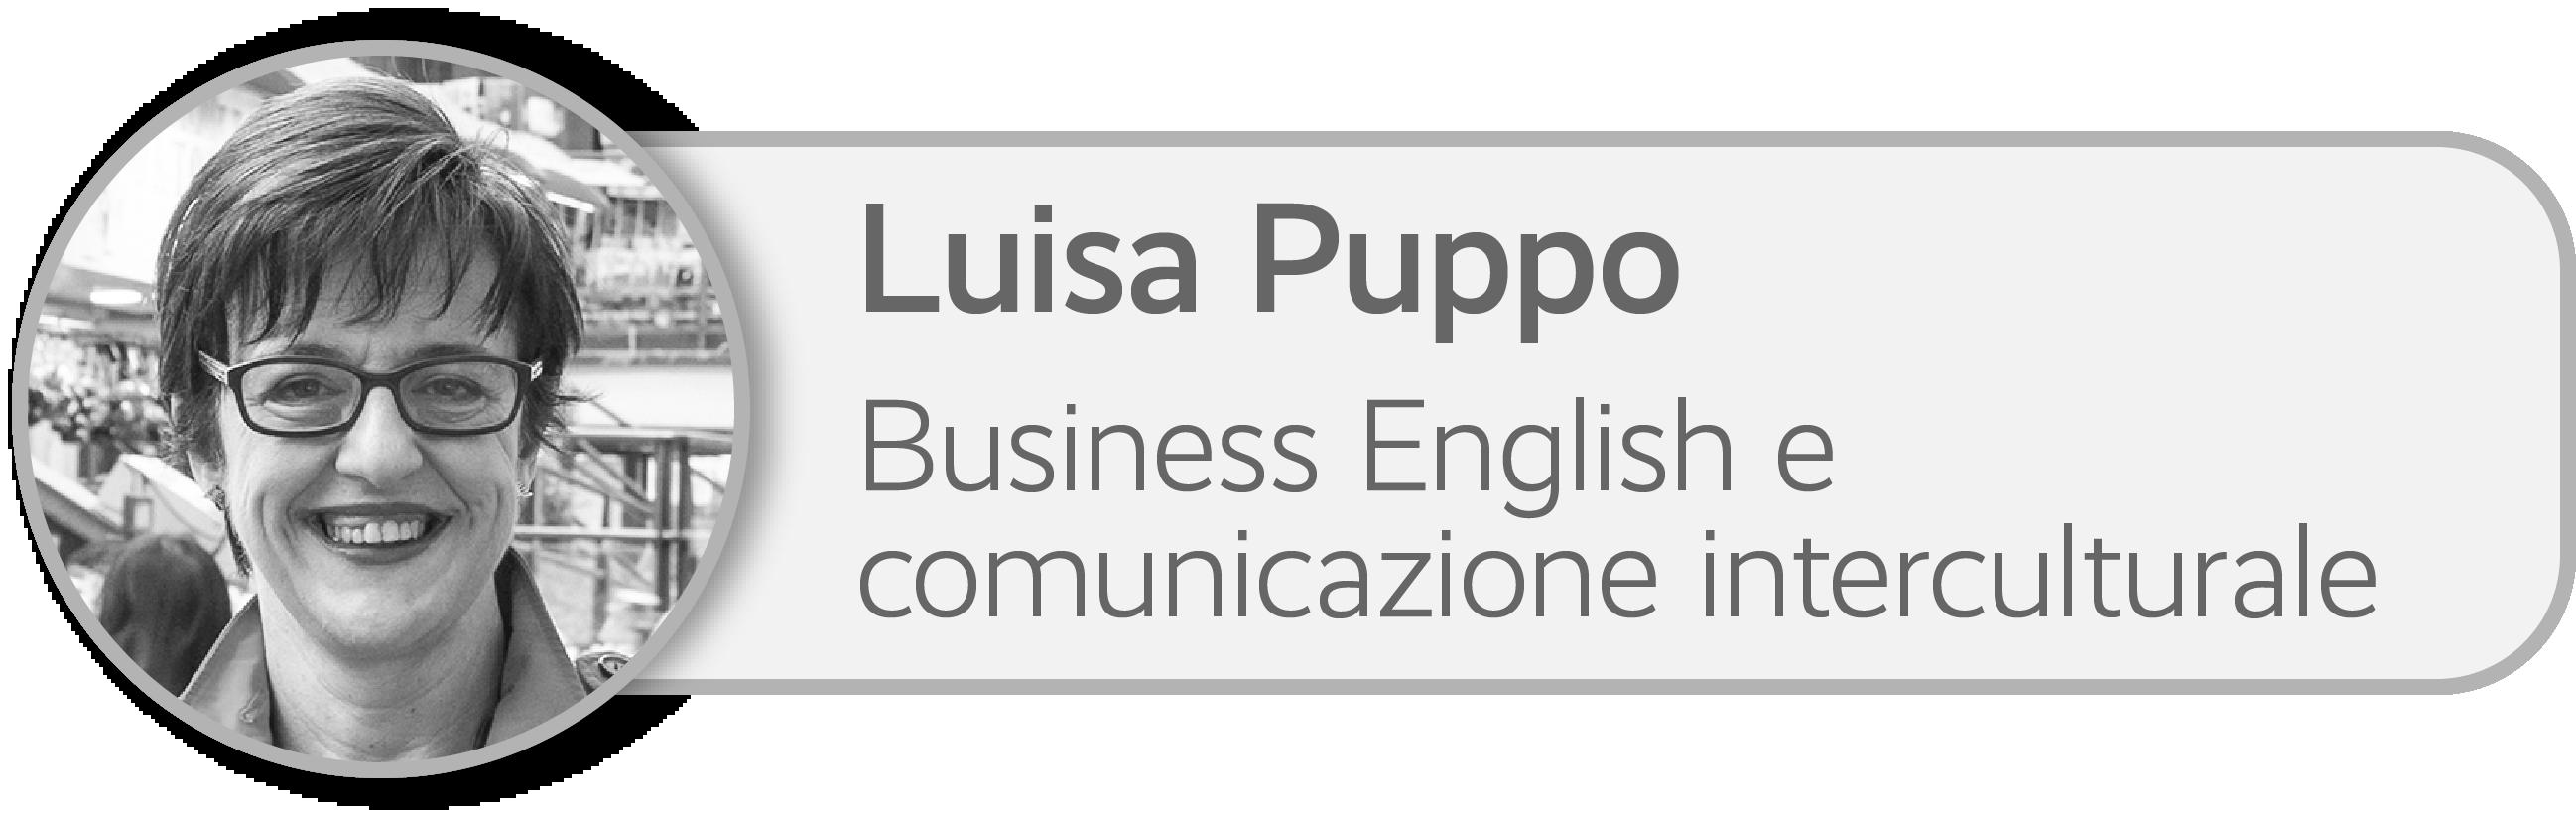 Luisa Puppo